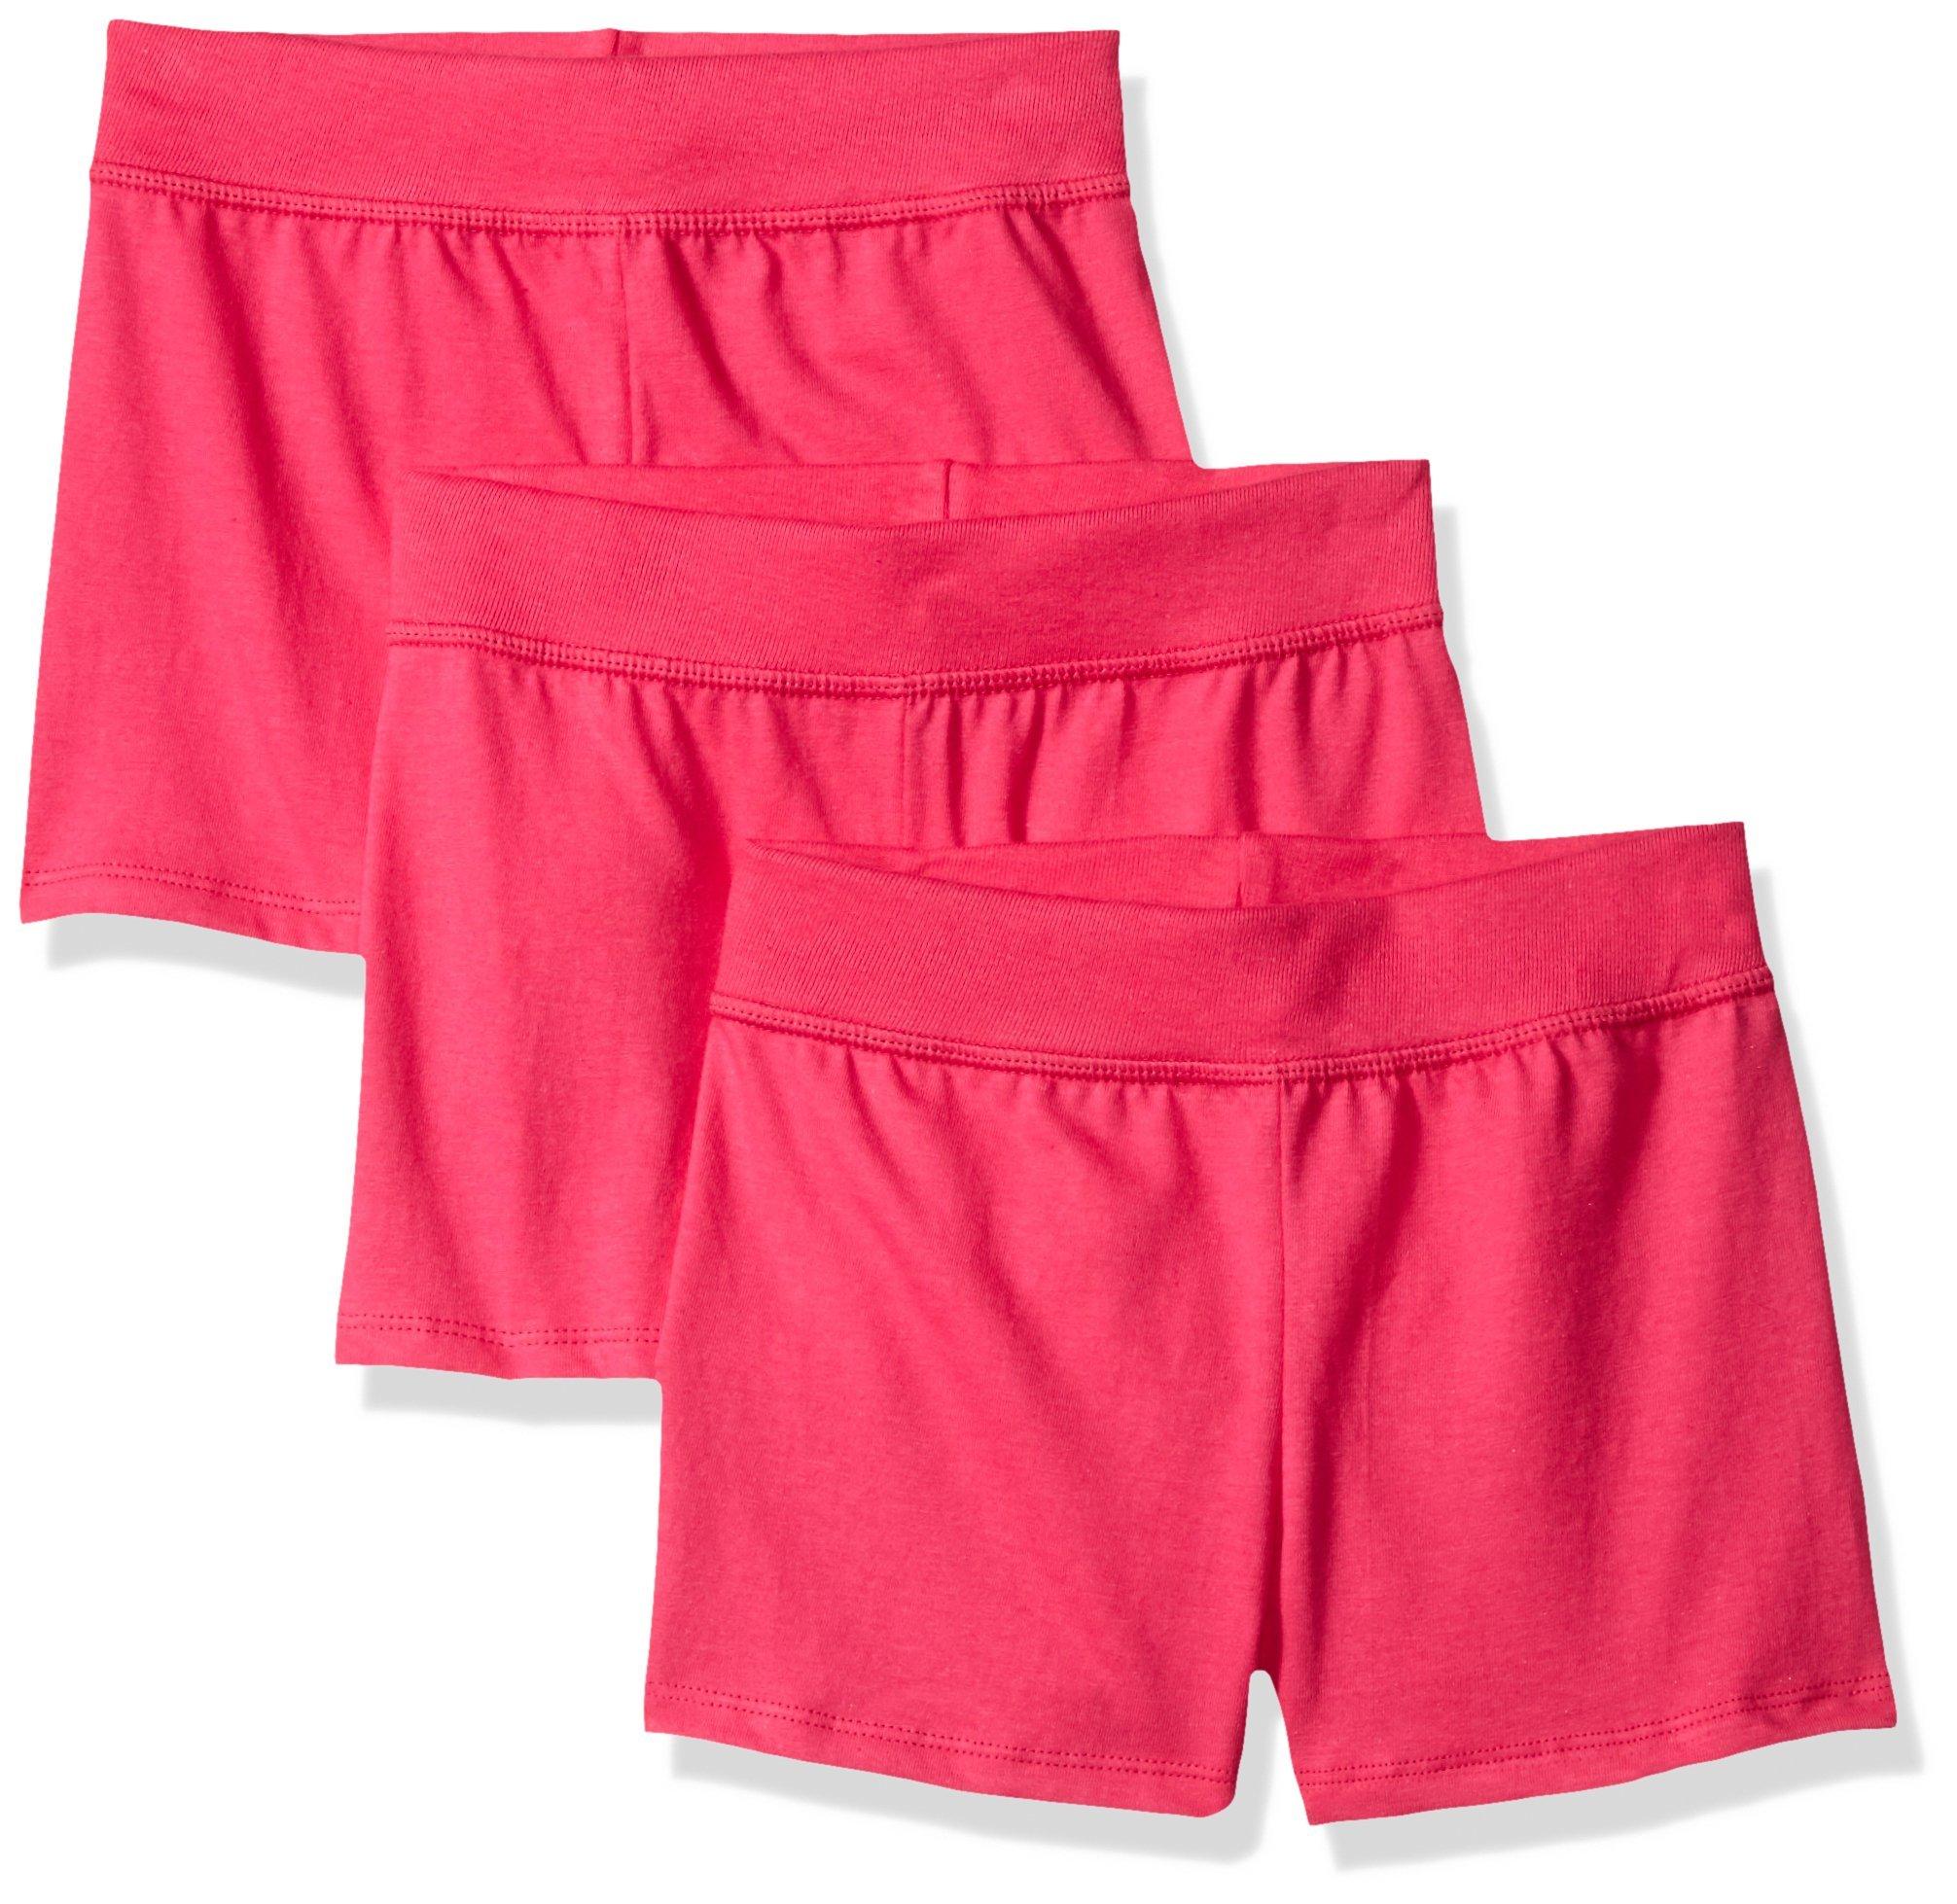 Hanes Little Girls' Jersey Short (Pack of 3), Amaranth, Large